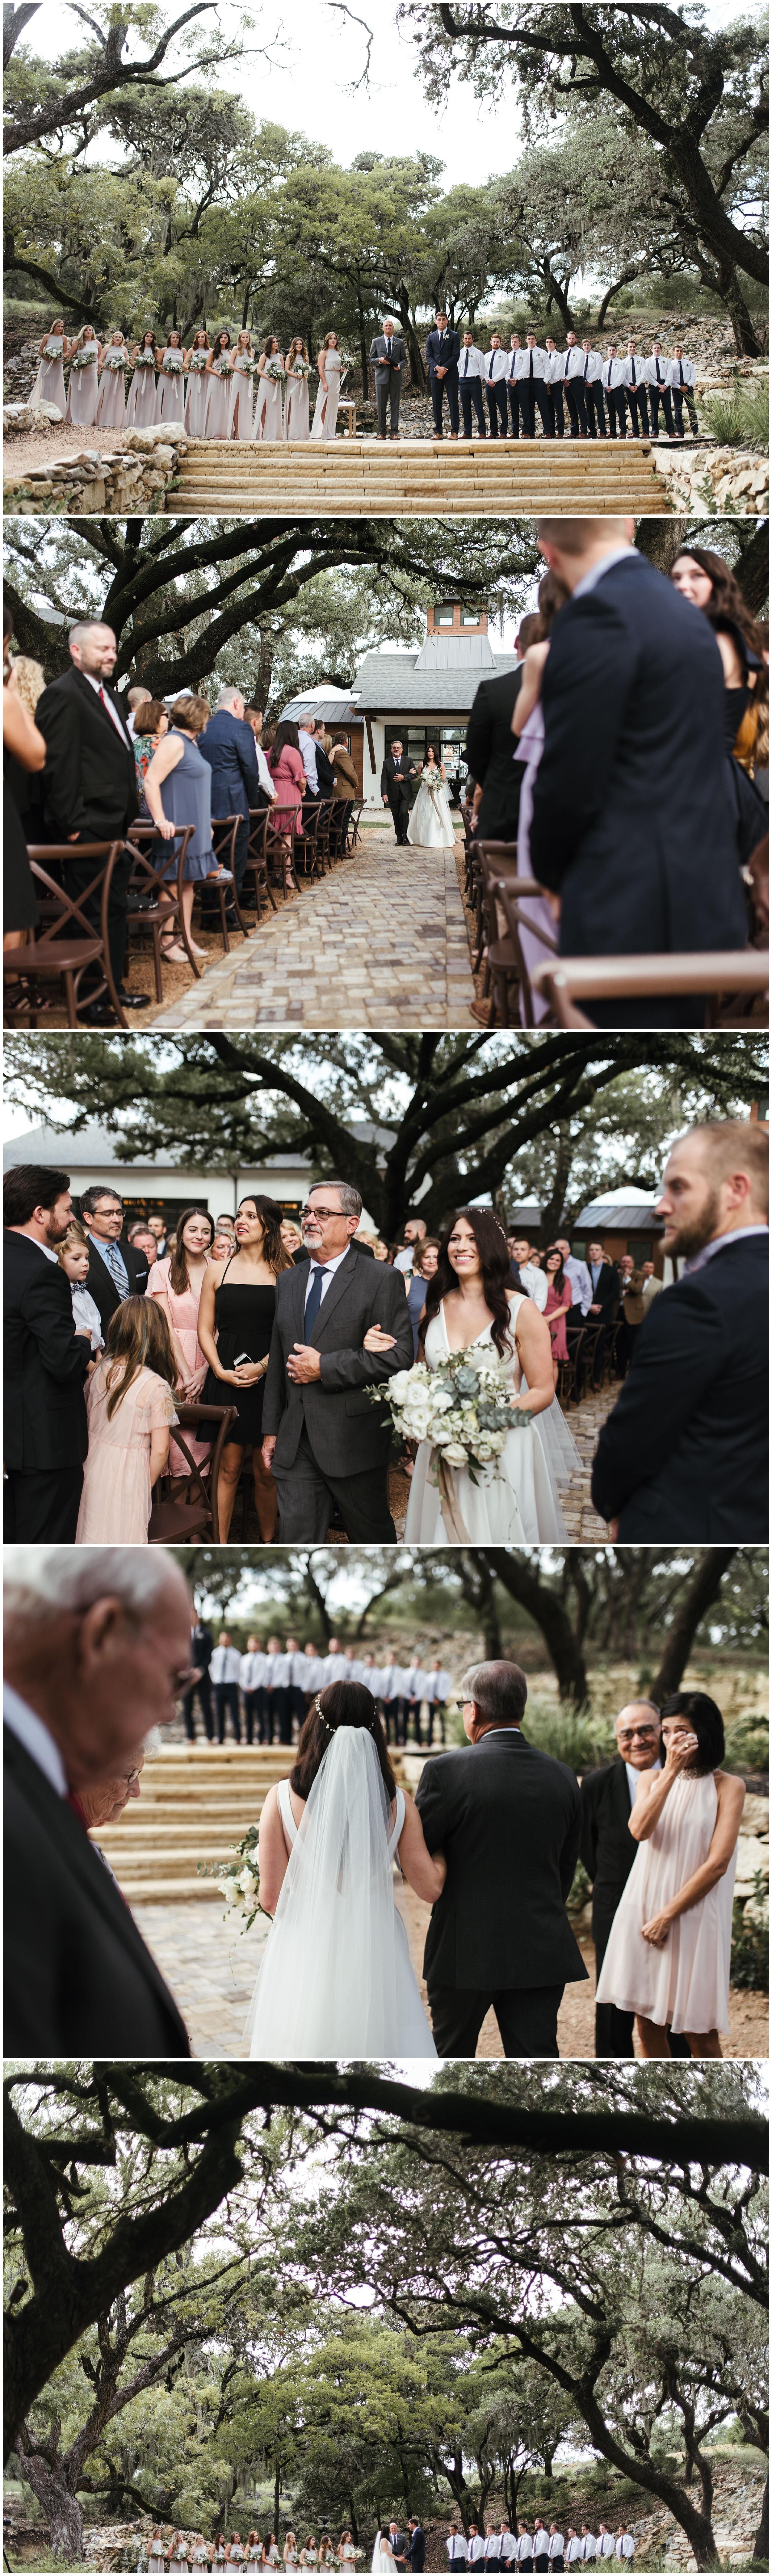 Hidden Falls Wedding   Kennedi+Marshall   Fort Worth Wedding Photographer   www.jordanmitchellphotography.com